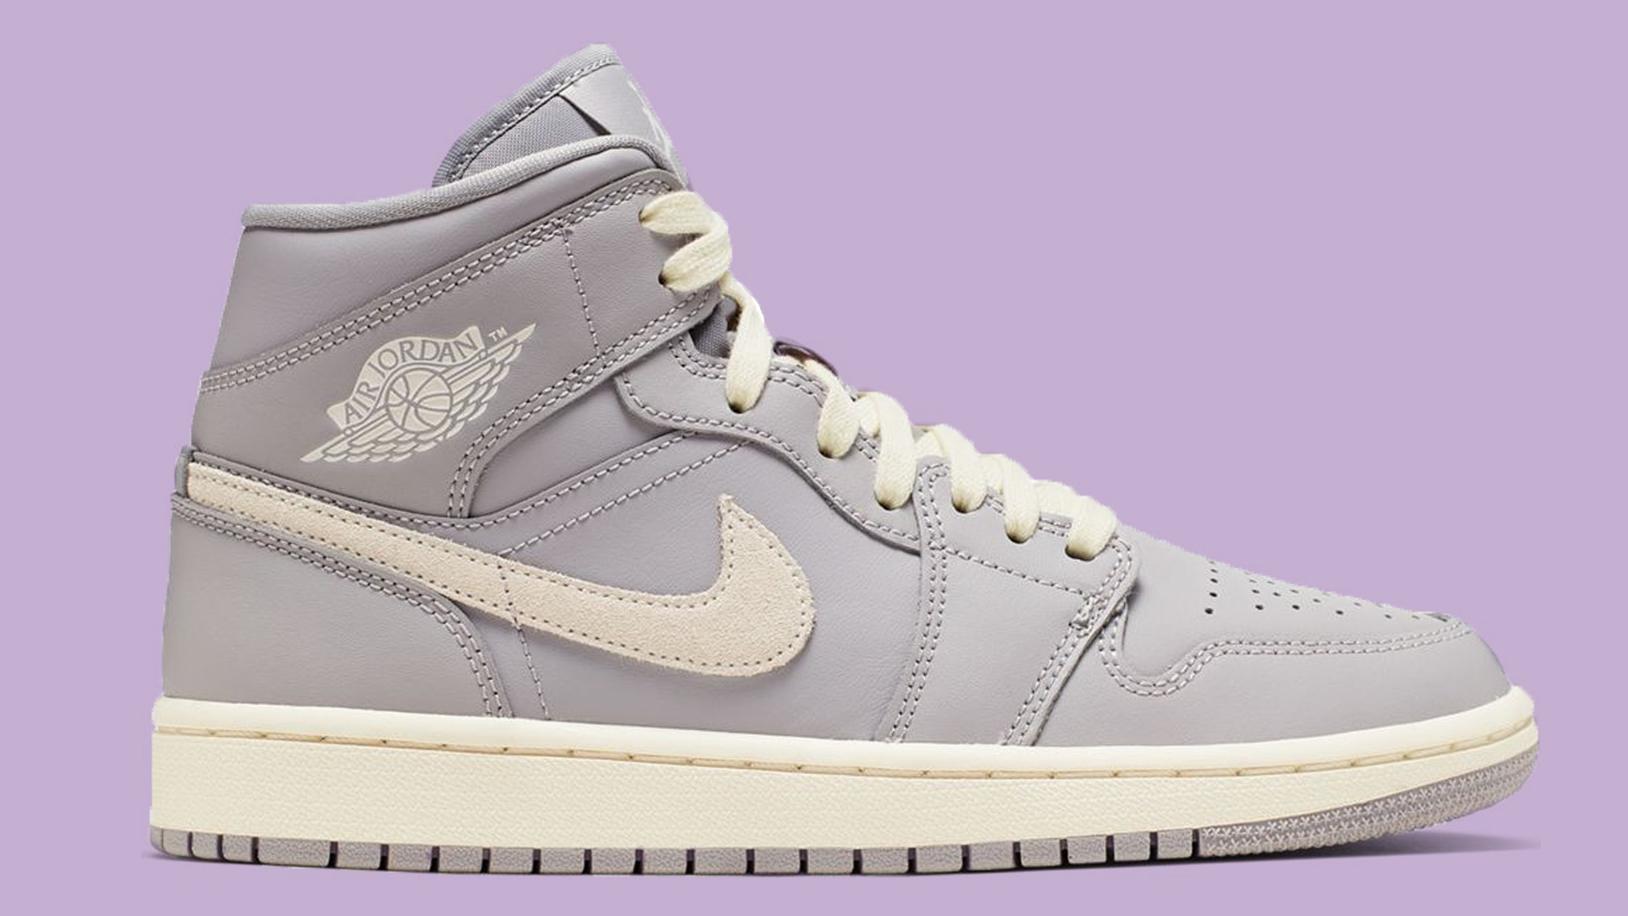 Nike Air Jordan 1 Atmosphere Grey